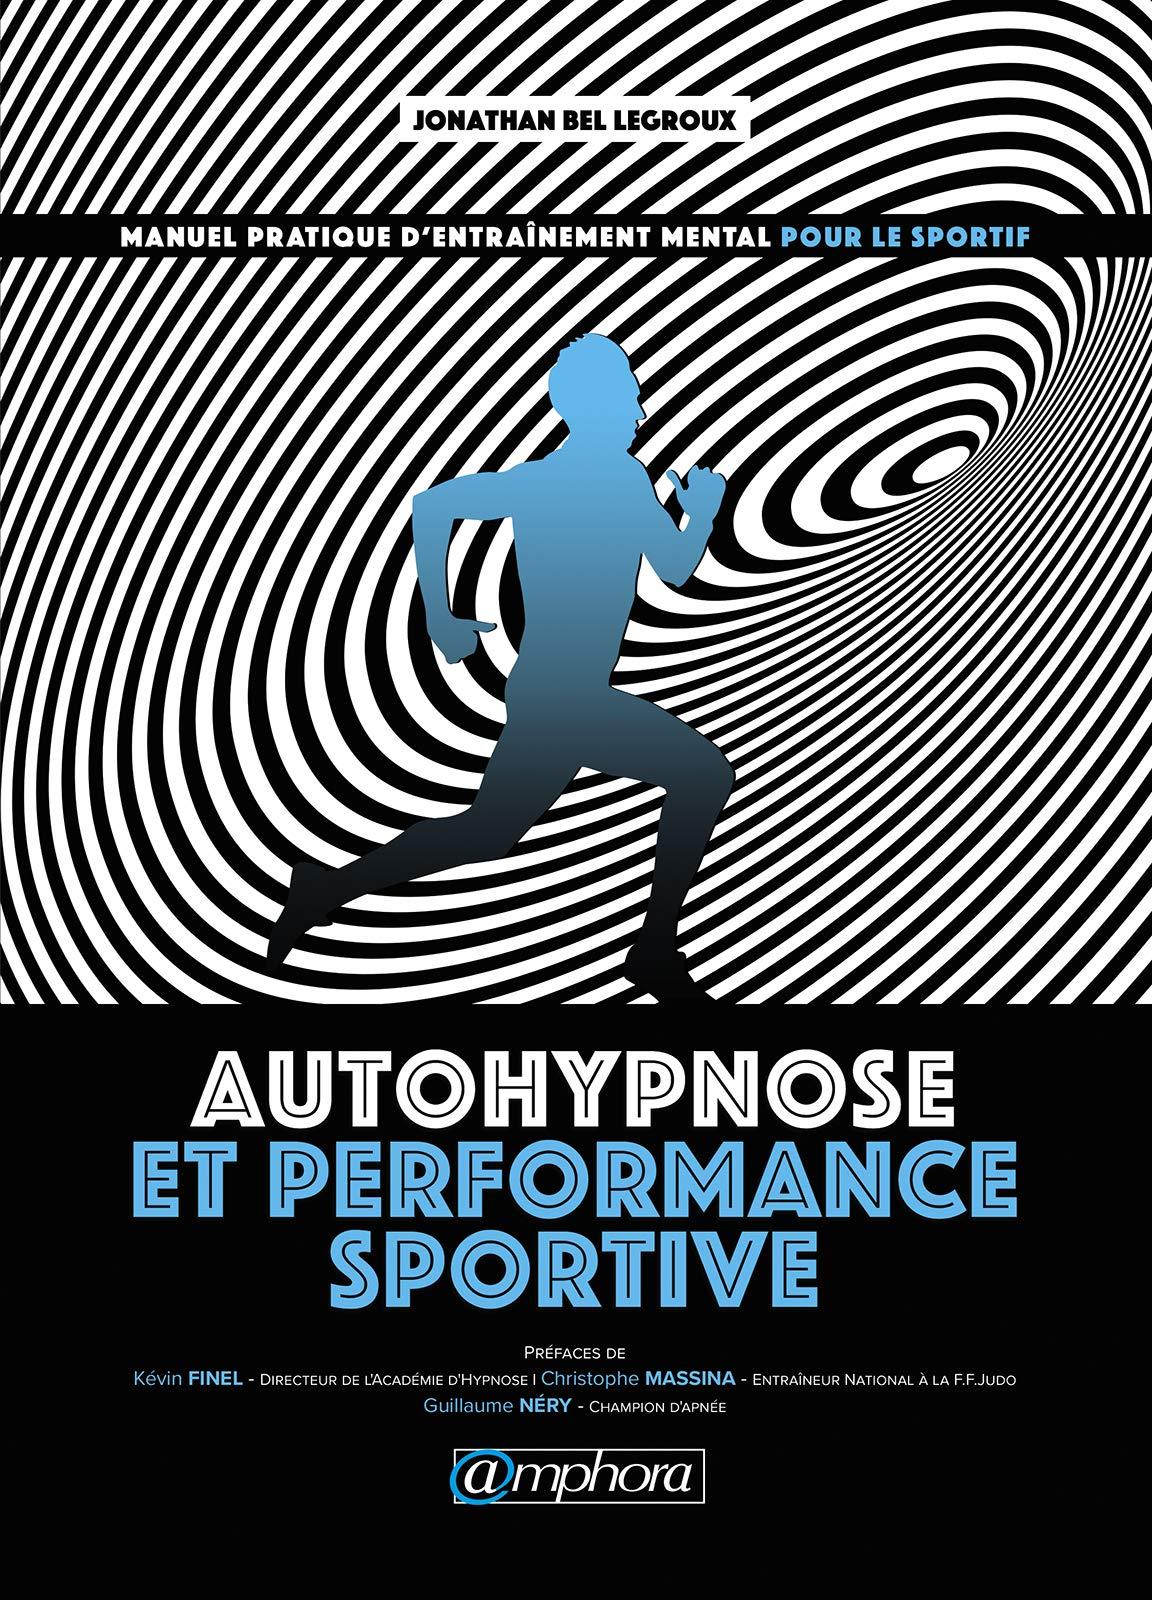 Autohypnose et performance sportive por Jonathan Bel Legroux